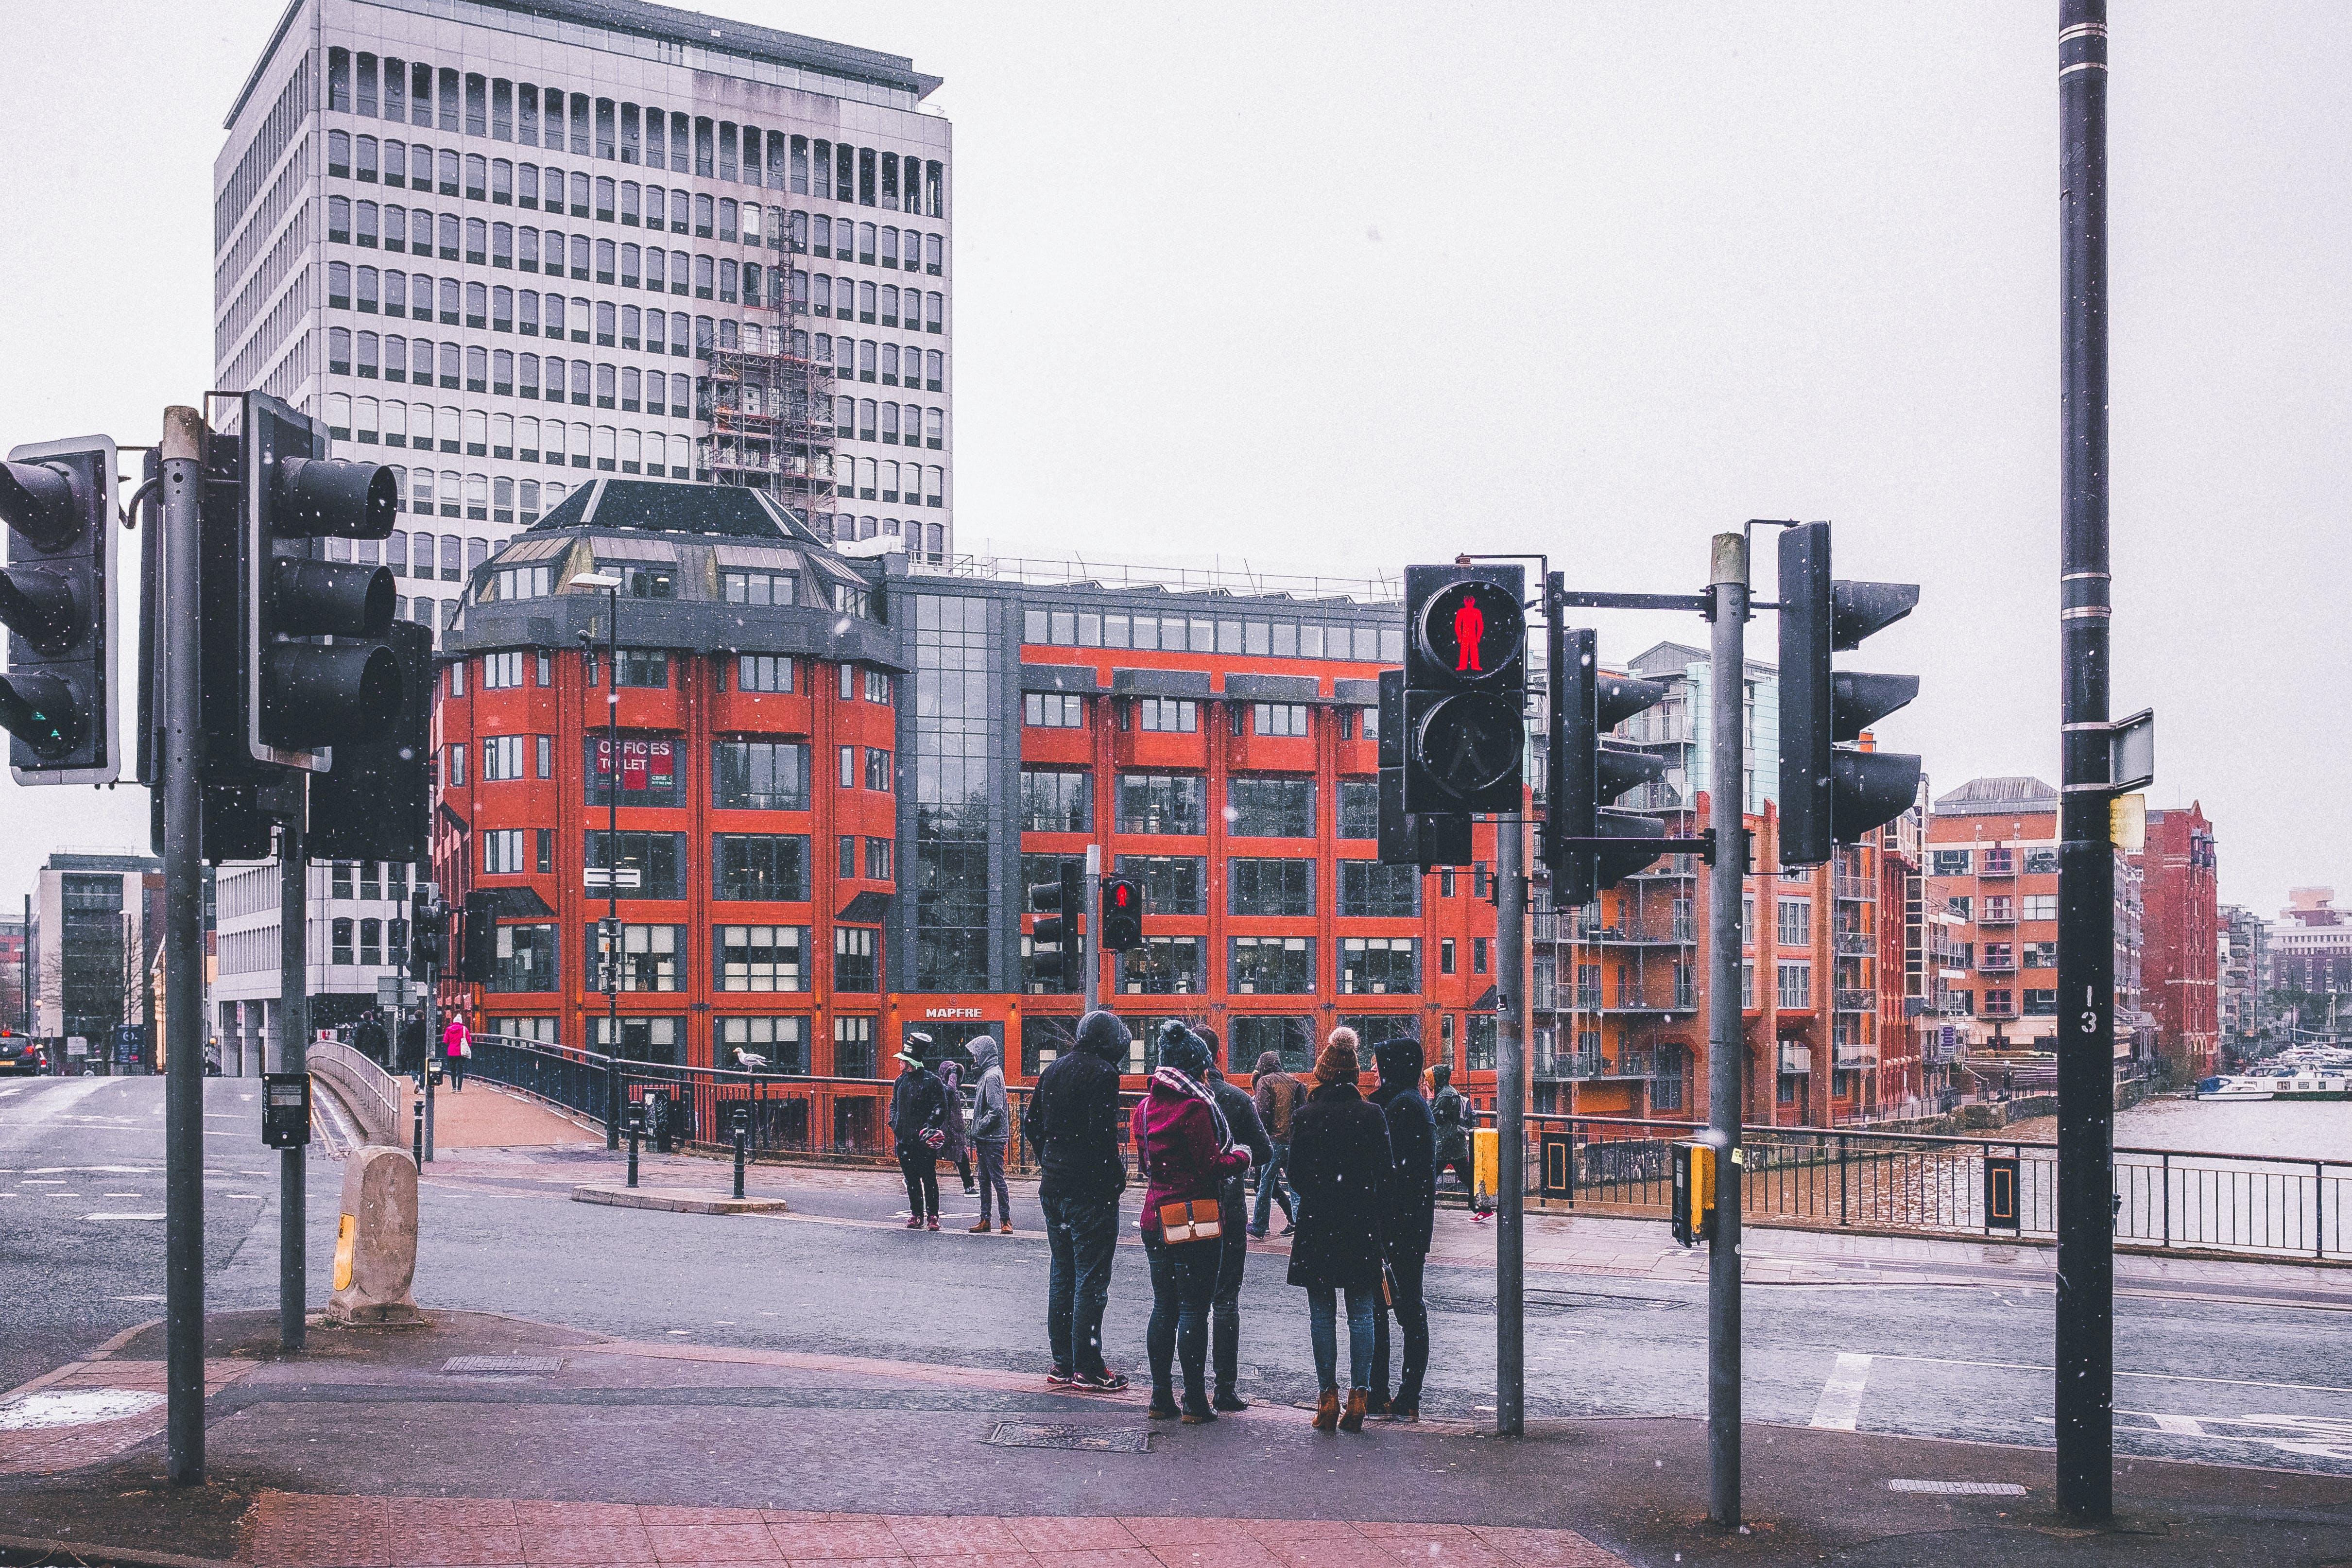 Portrait Photography of People Near Street Light